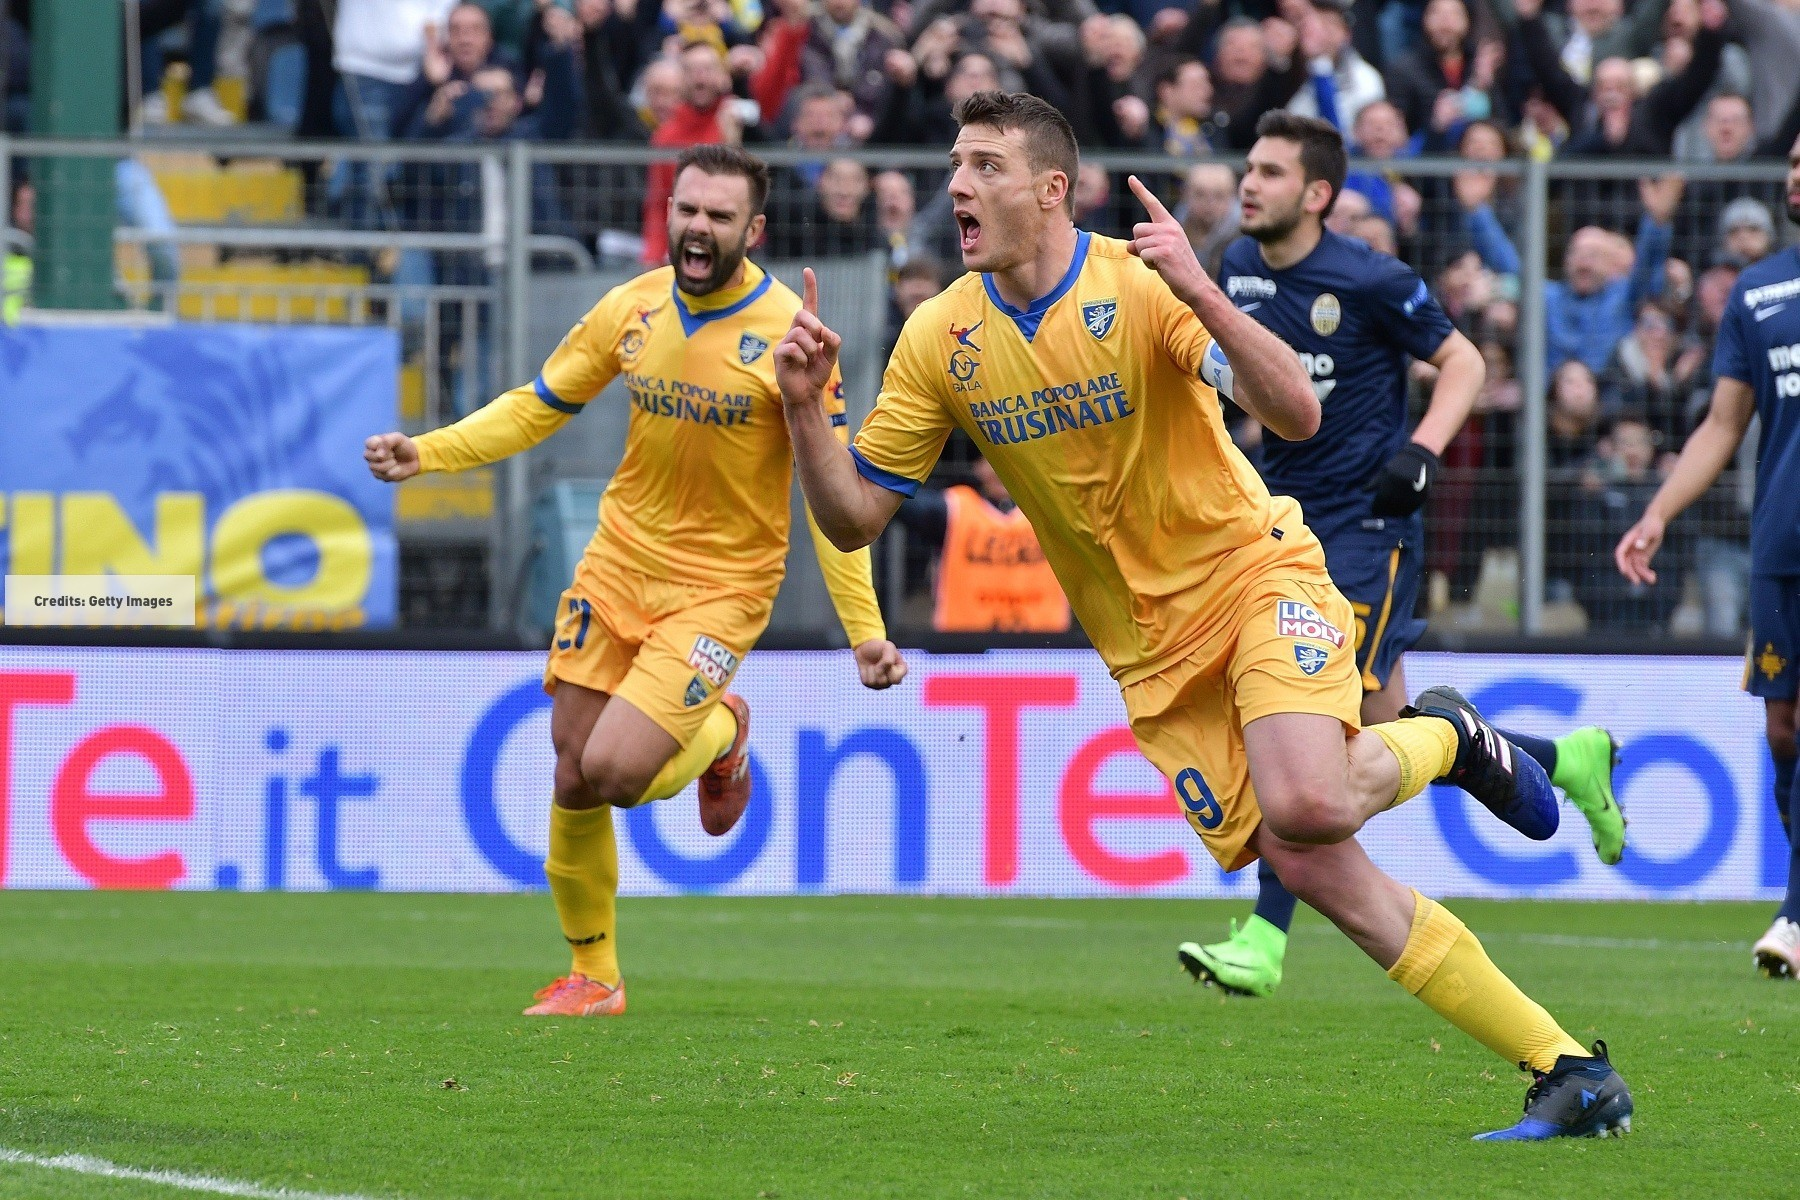 Playoff Serie B semifinali di ritorno